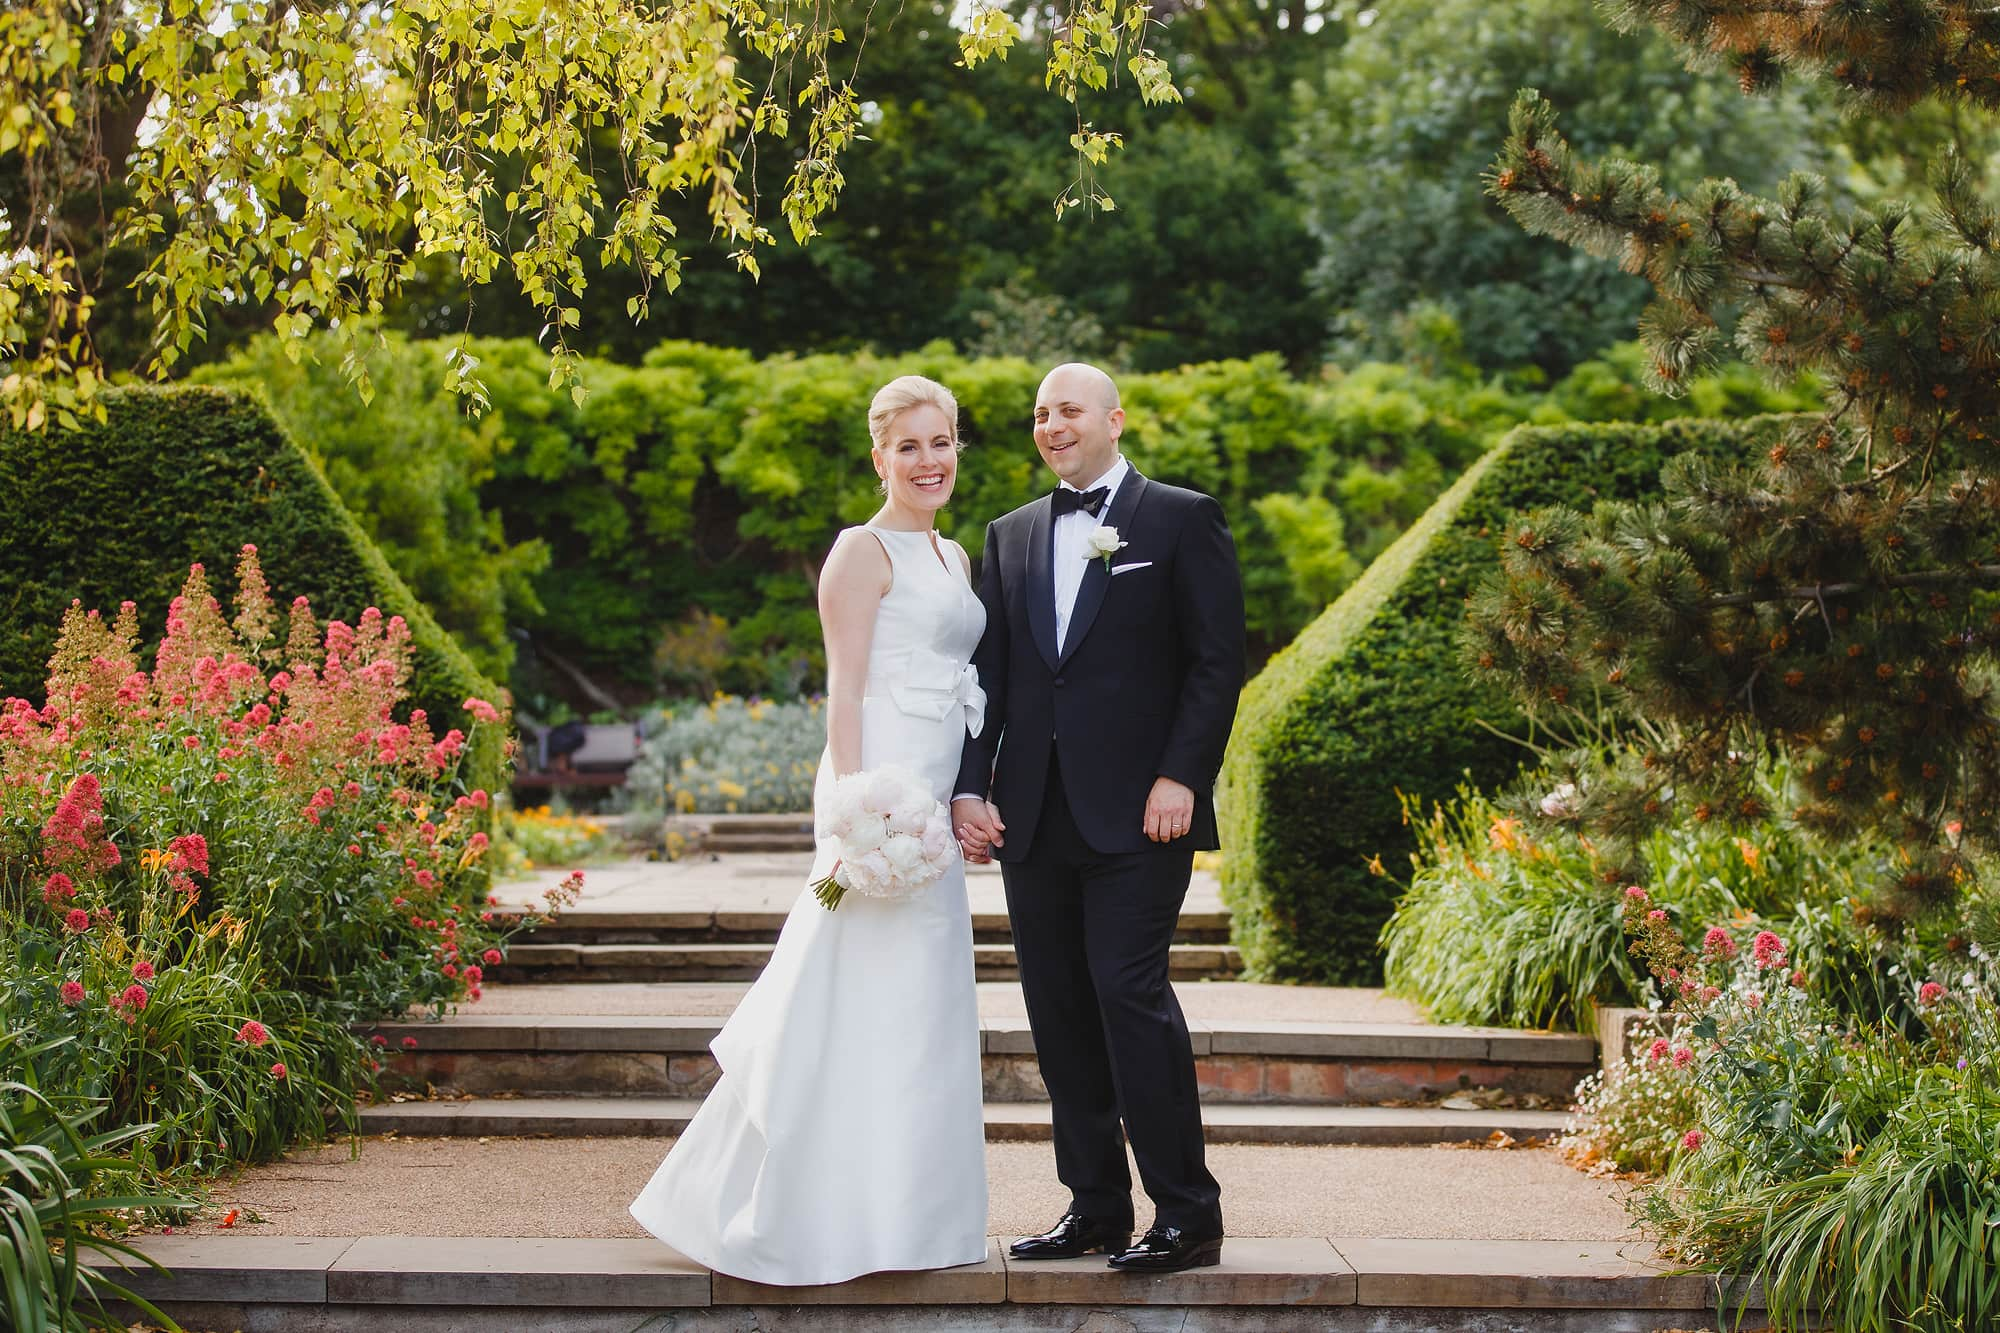 Belvedere wedding photography of Venetia and Jeremie